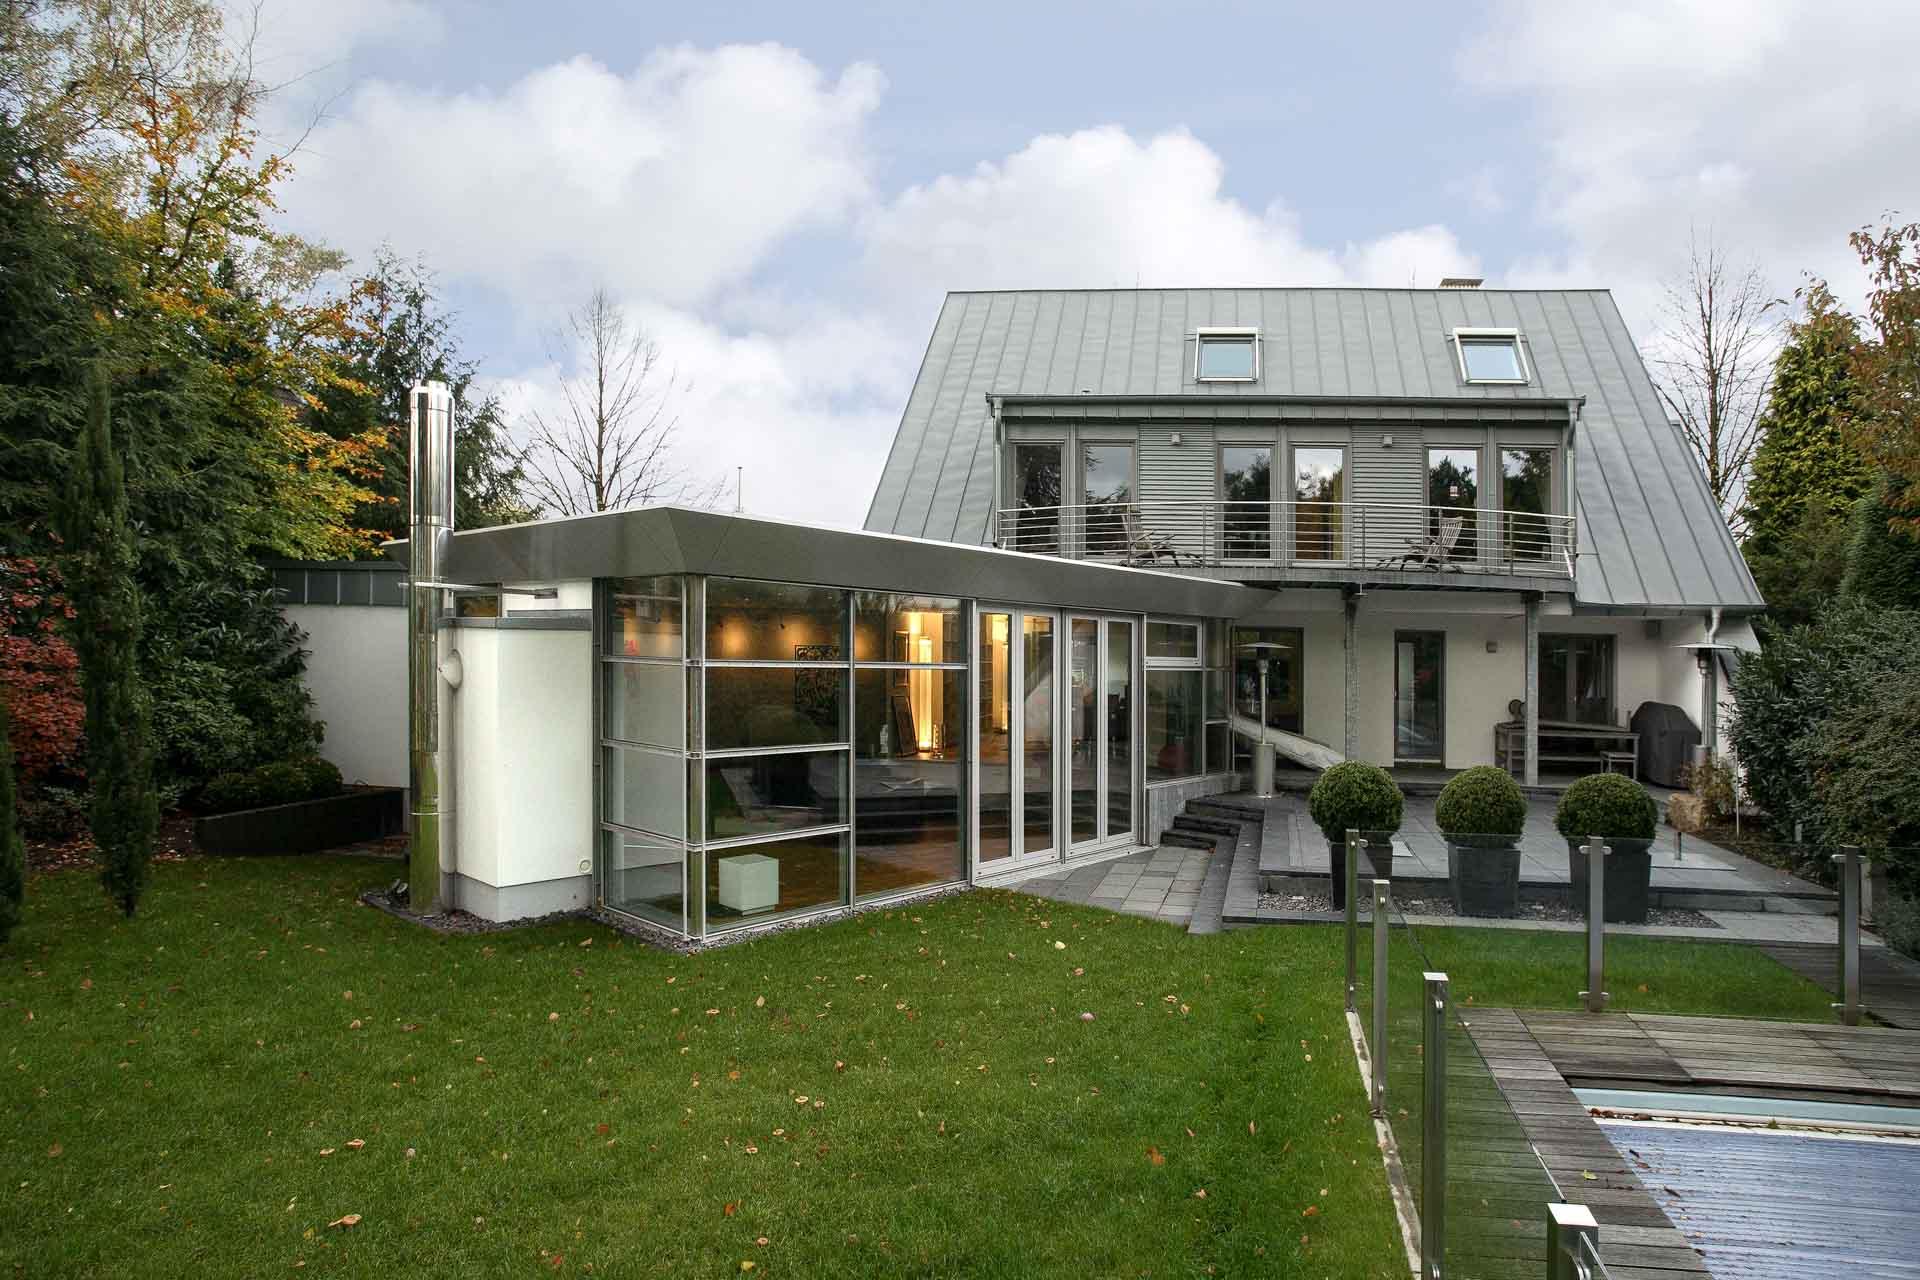 conservatory in Essen (object 1027). FineArt winter garden as living space in the garden.